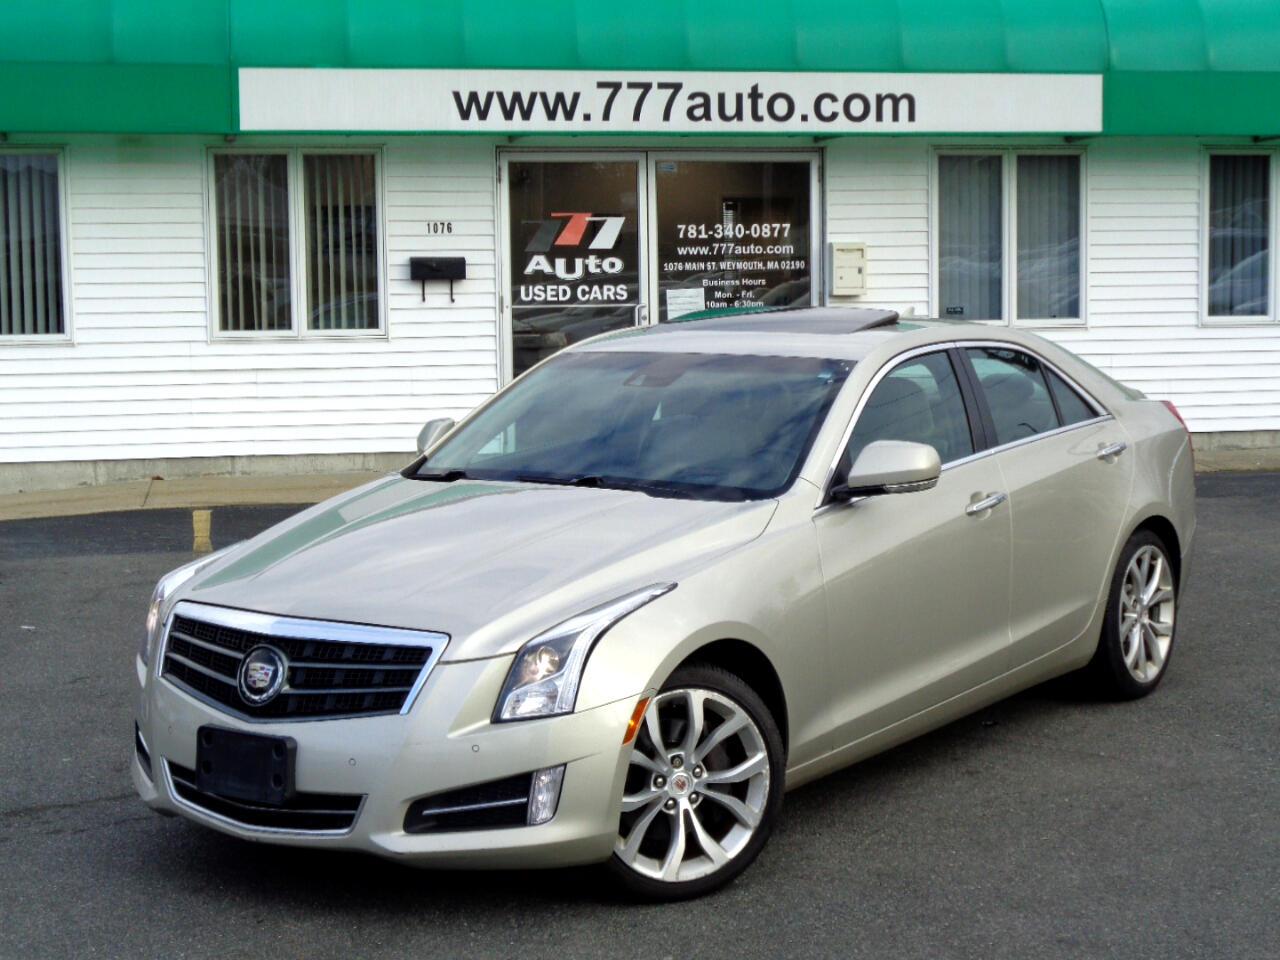 Cadillac ATS 4dr Sdn 3.6L Premium AWD 2013